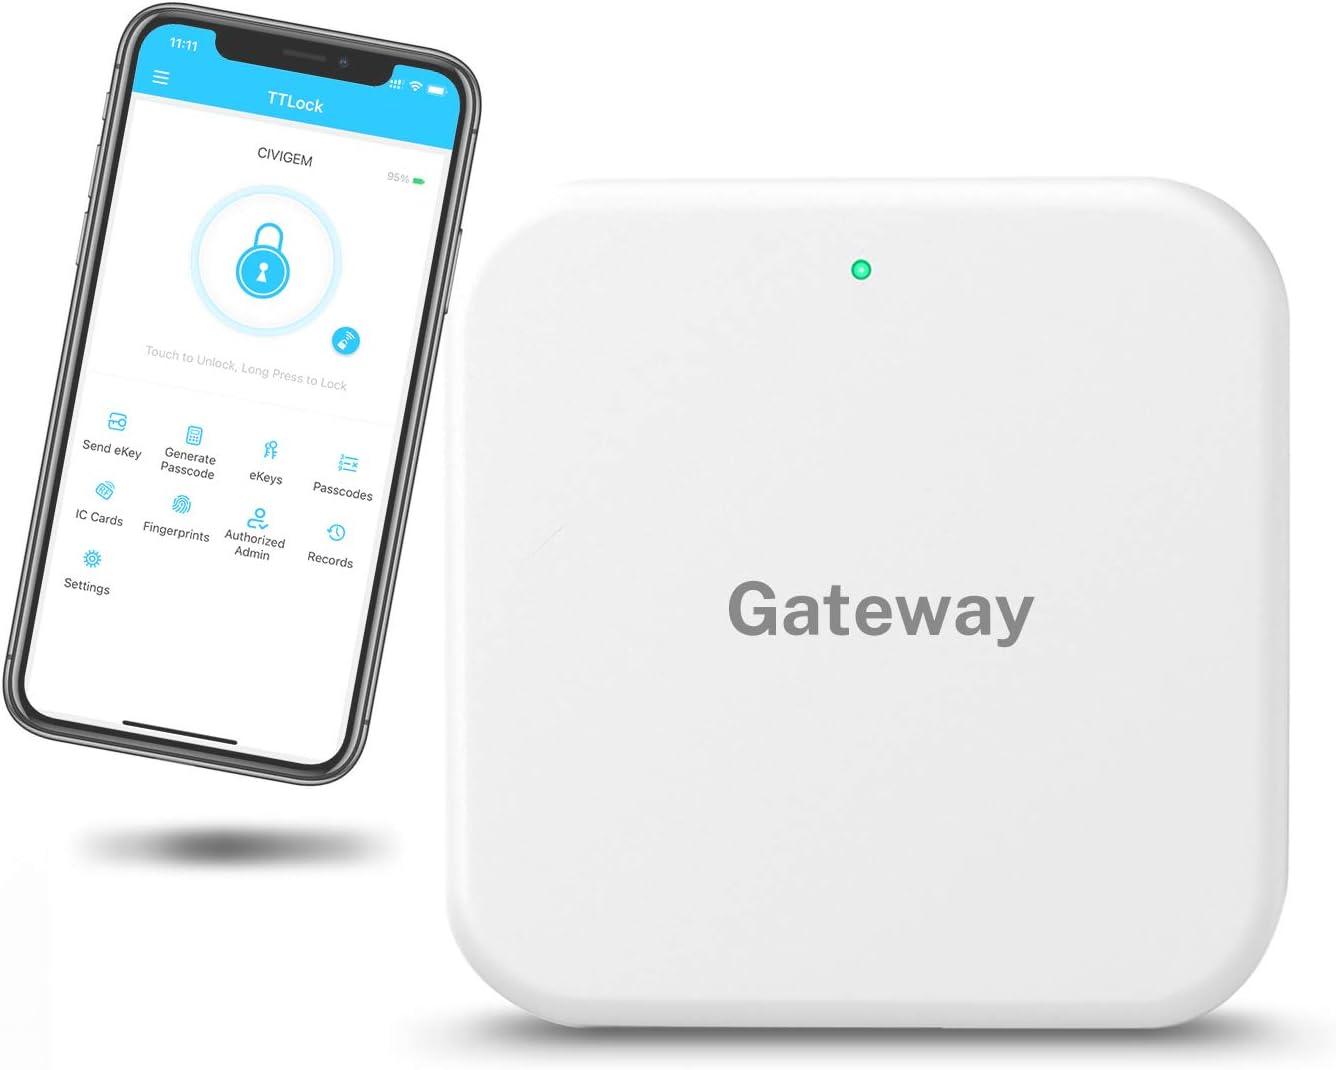 Keyless Entry Door Lock,Smart Door Lock,Smart Lock Front Door, Remotely Control Your Smart Phone, Gateway Works with 2.4 GHz,Works for TTLock APP,Wi-Fi Gateway by CIVIGEM